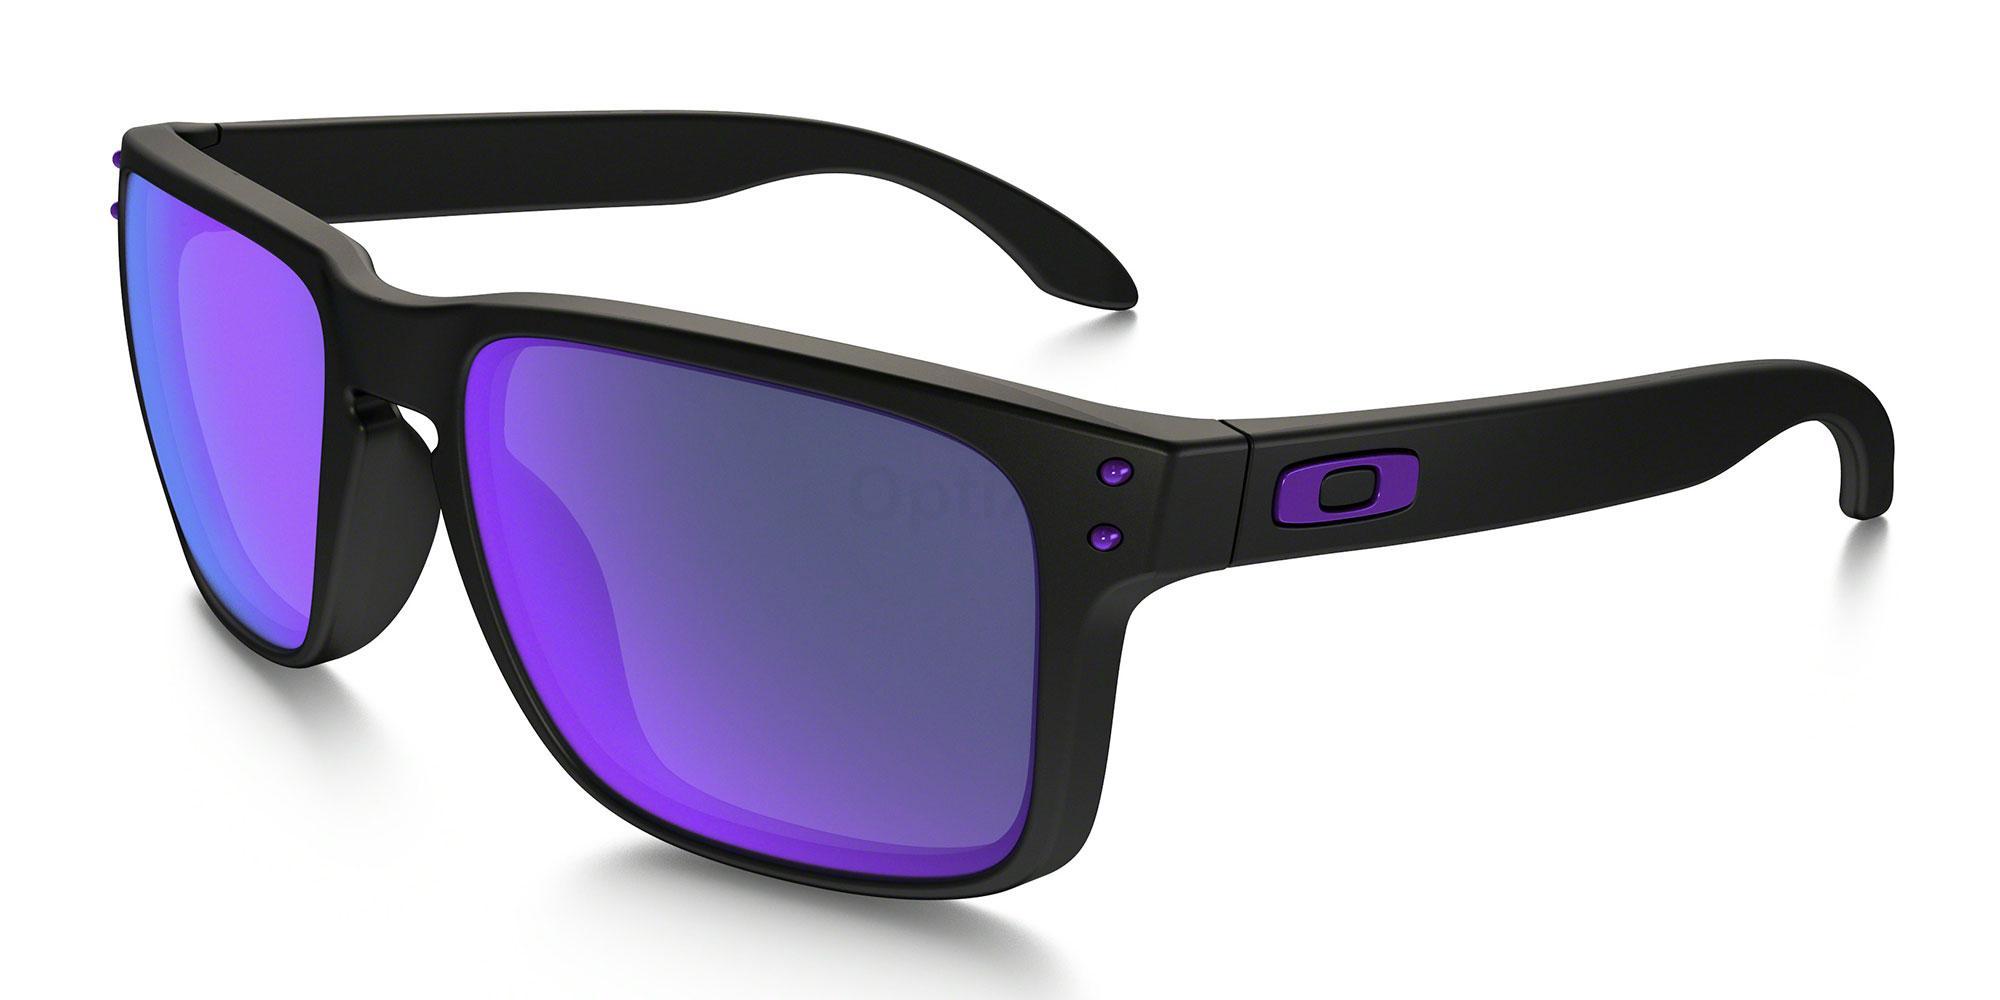 910226 OO9102 JULIAN WILSON SIGNATURE SERIES HOLBROOK Sunglasses, Oakley